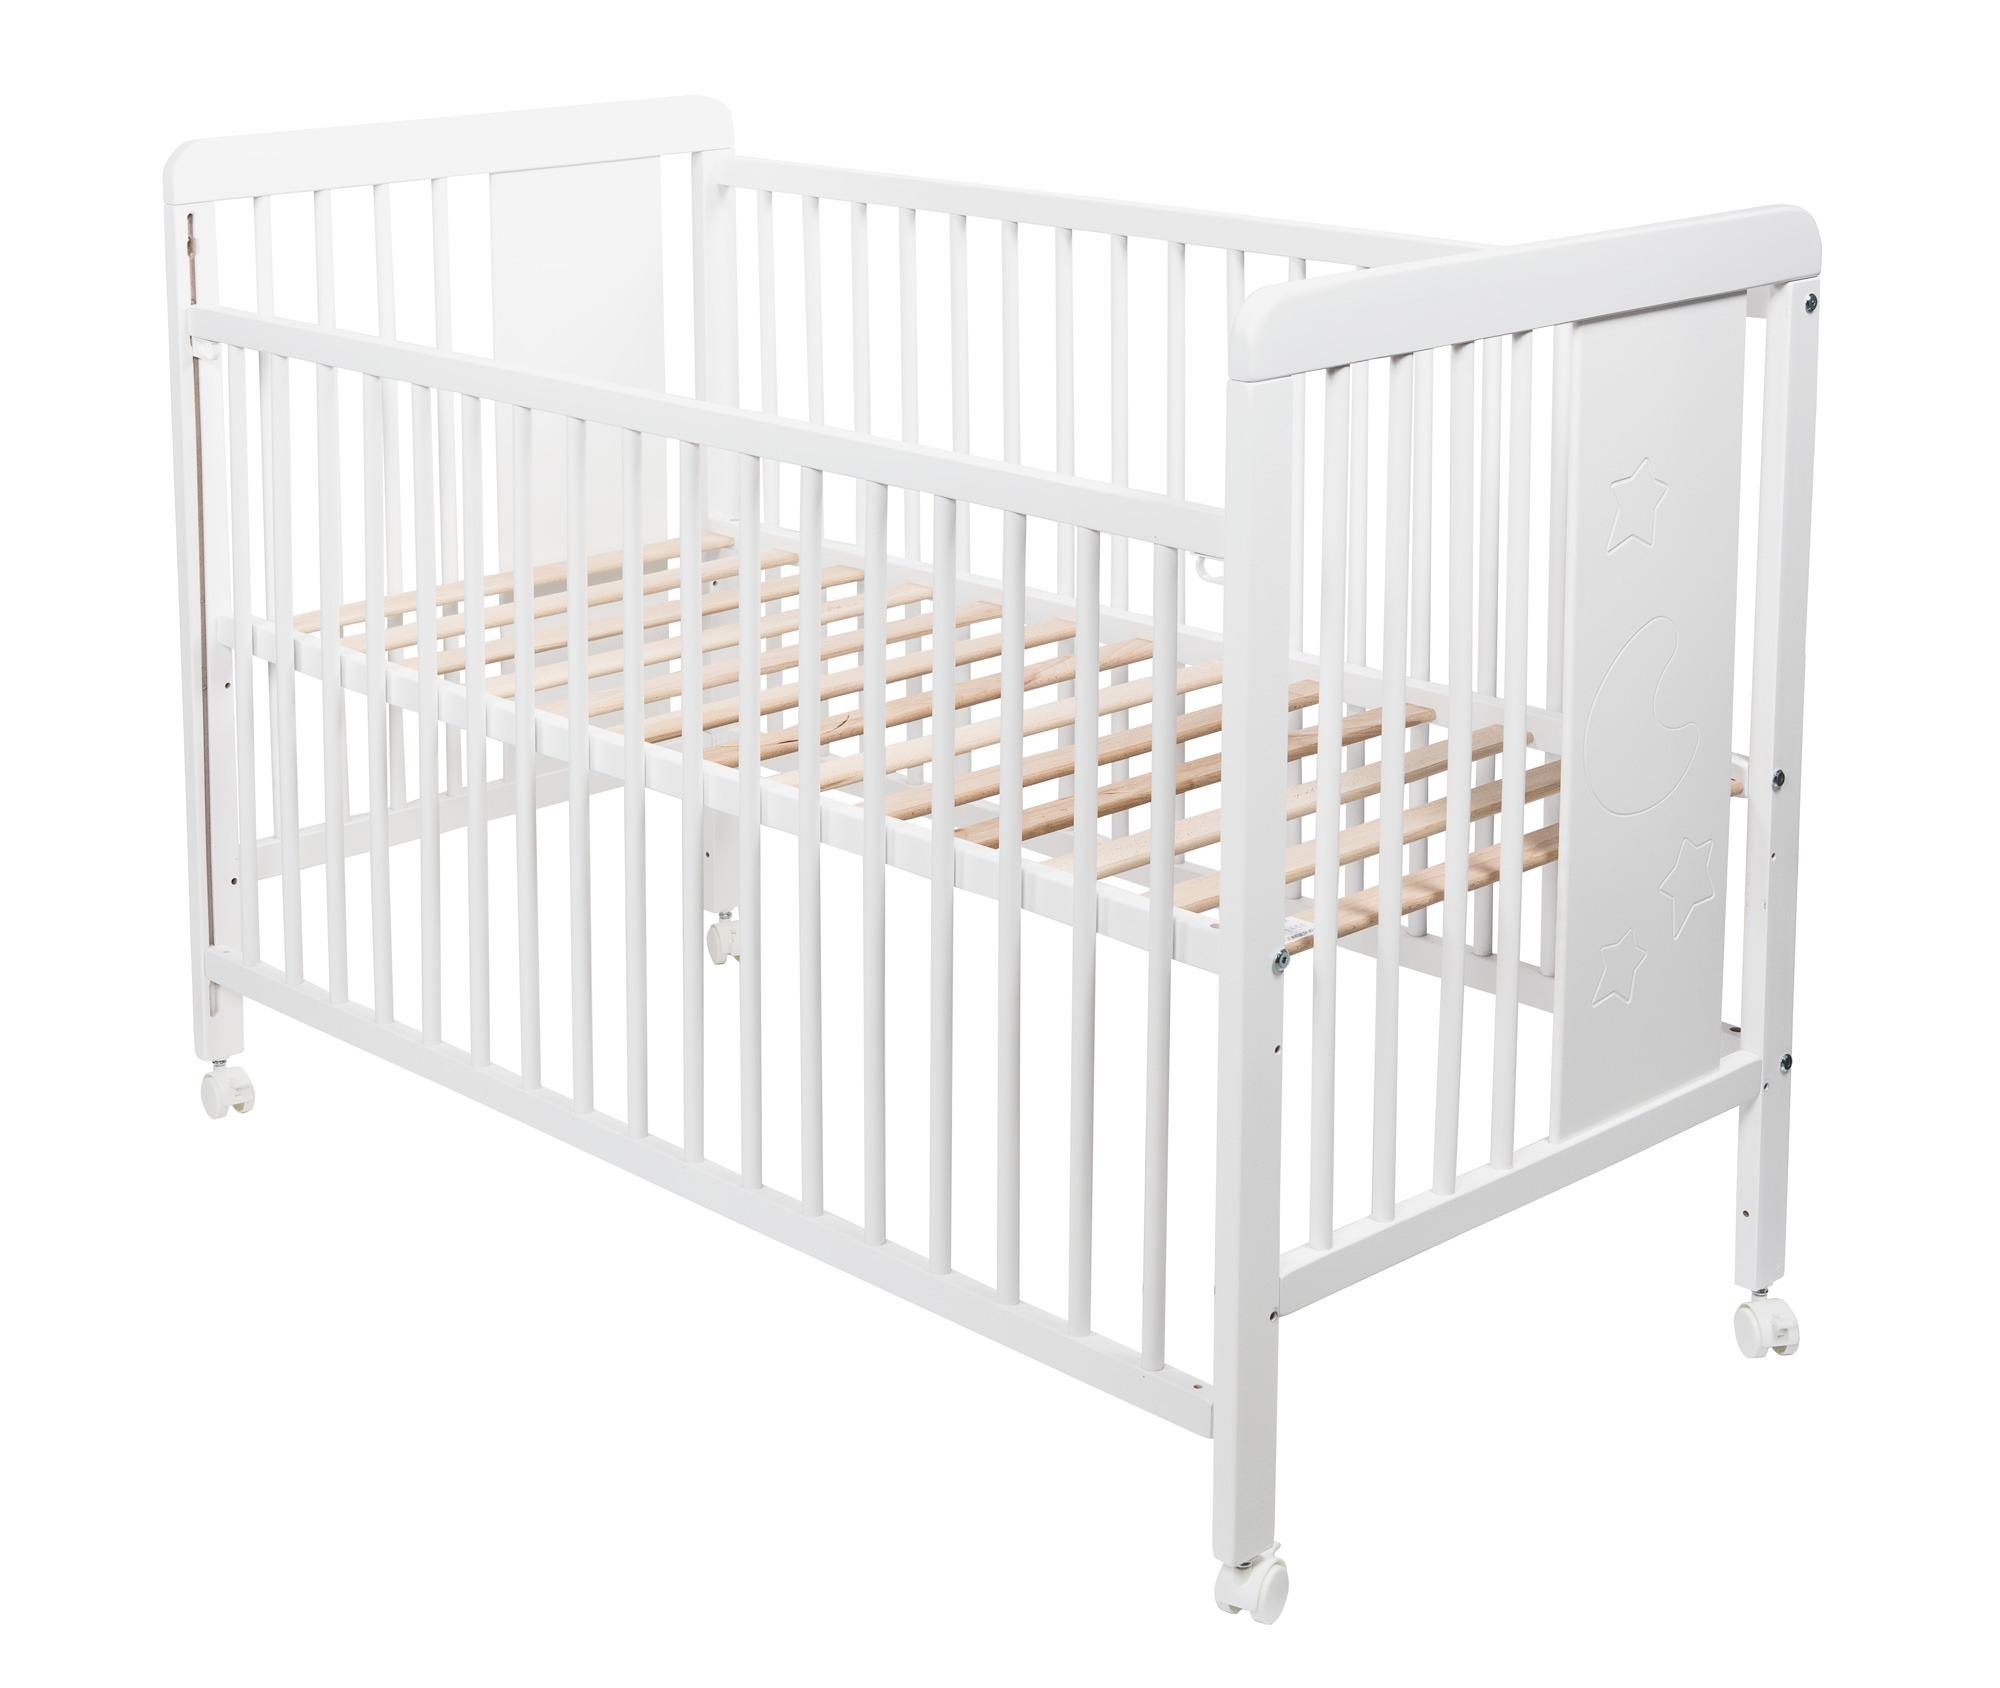 baby m bel m6 pinnas nky s ngyt huonekalut ja sisustus. Black Bedroom Furniture Sets. Home Design Ideas